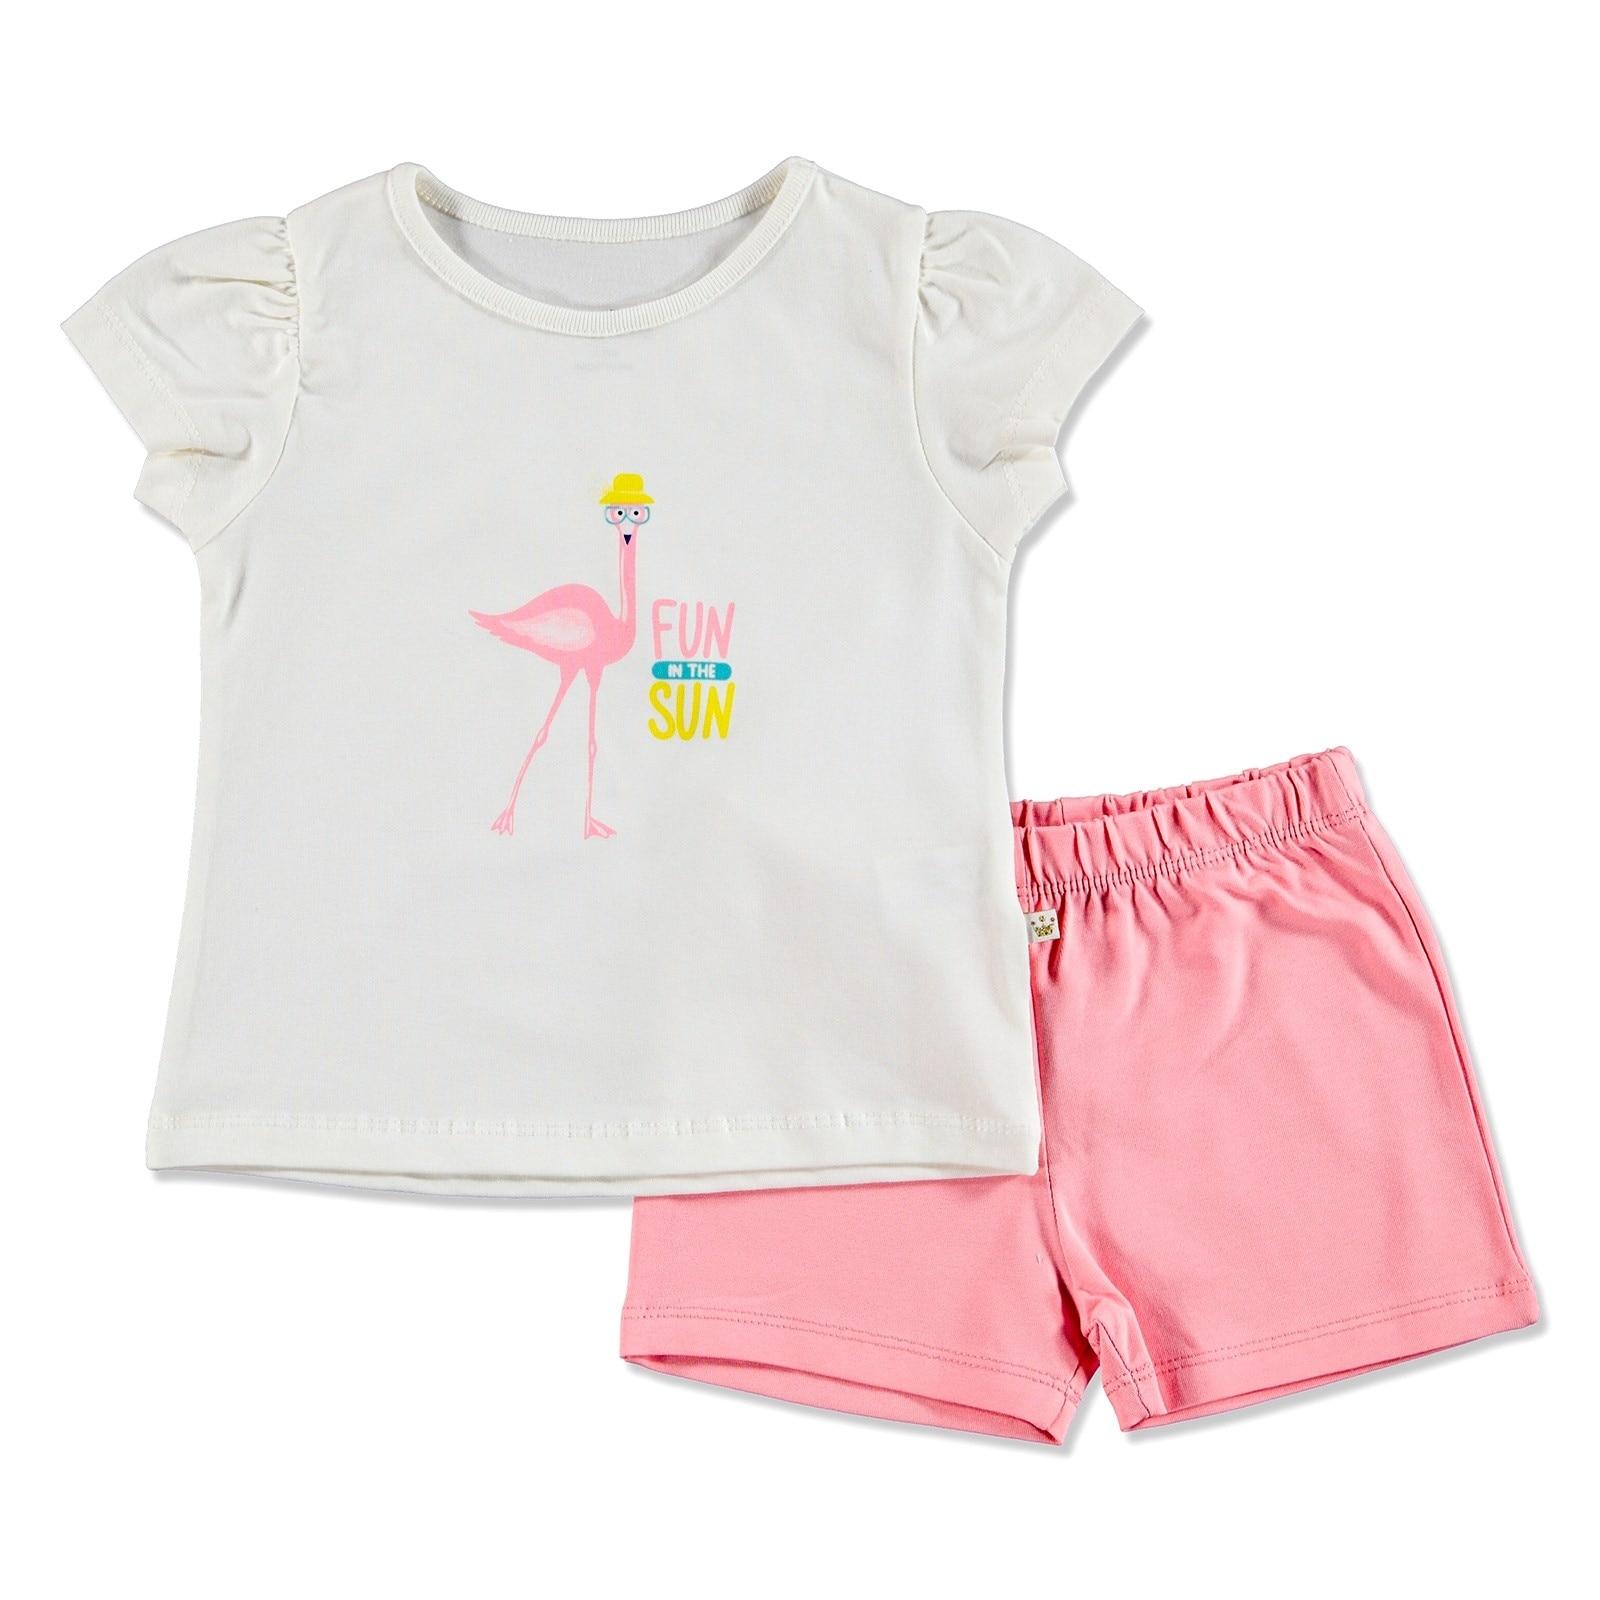 Ebebek For My Baby Summer Girl Flamingo T-shirt Short 2 Pcs Set